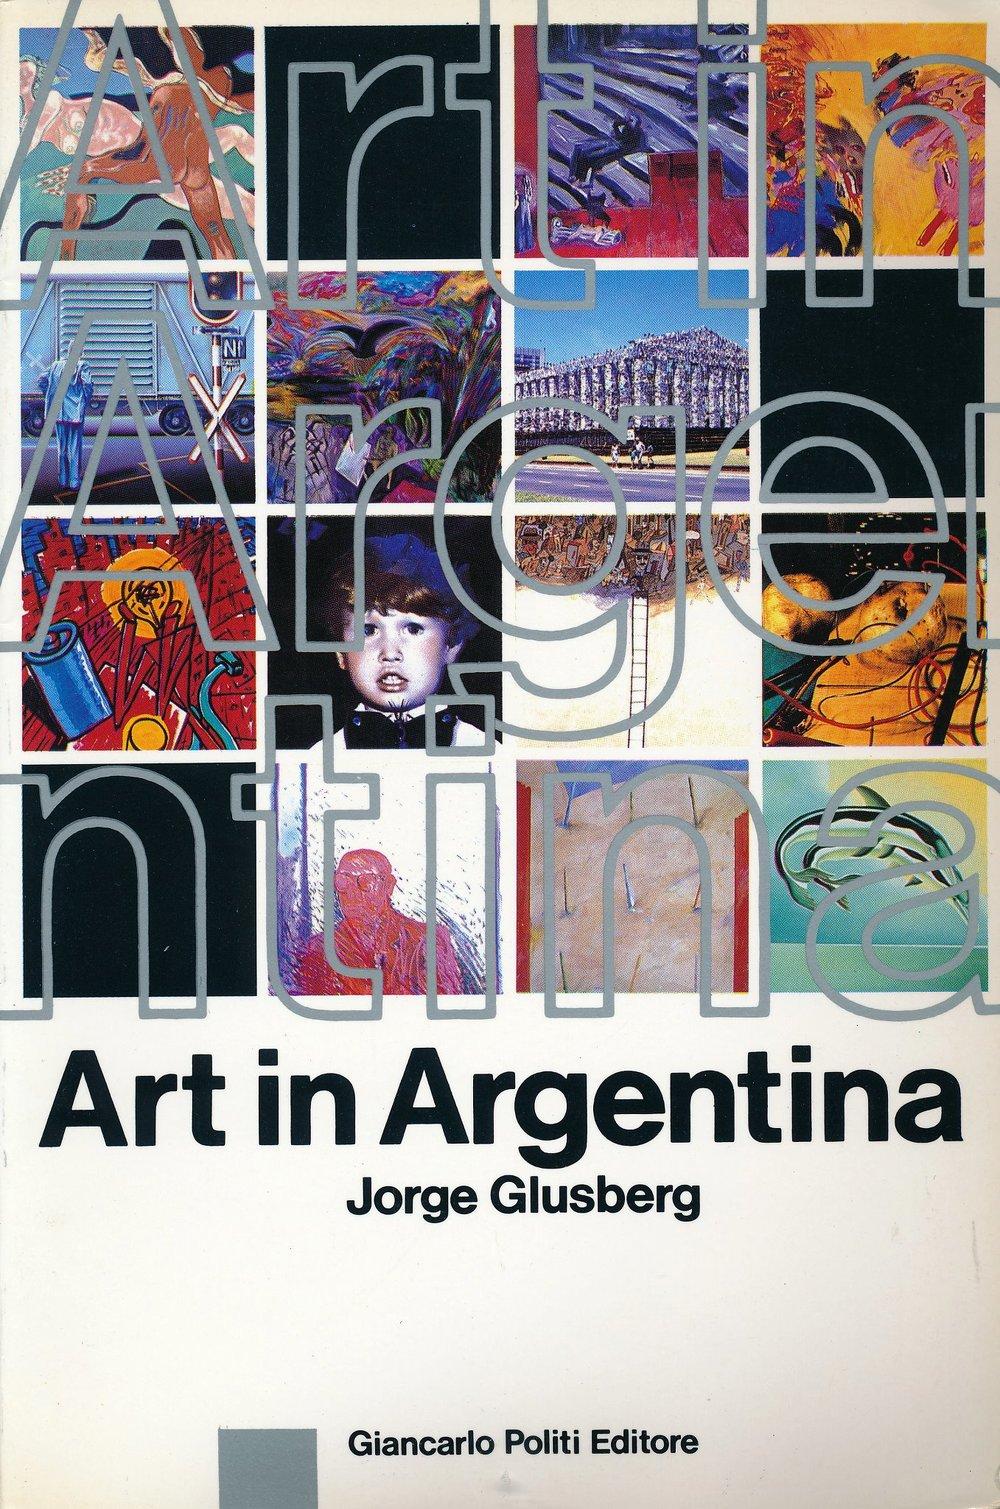 Art in Argentina, Jorge Glusberg, 1986